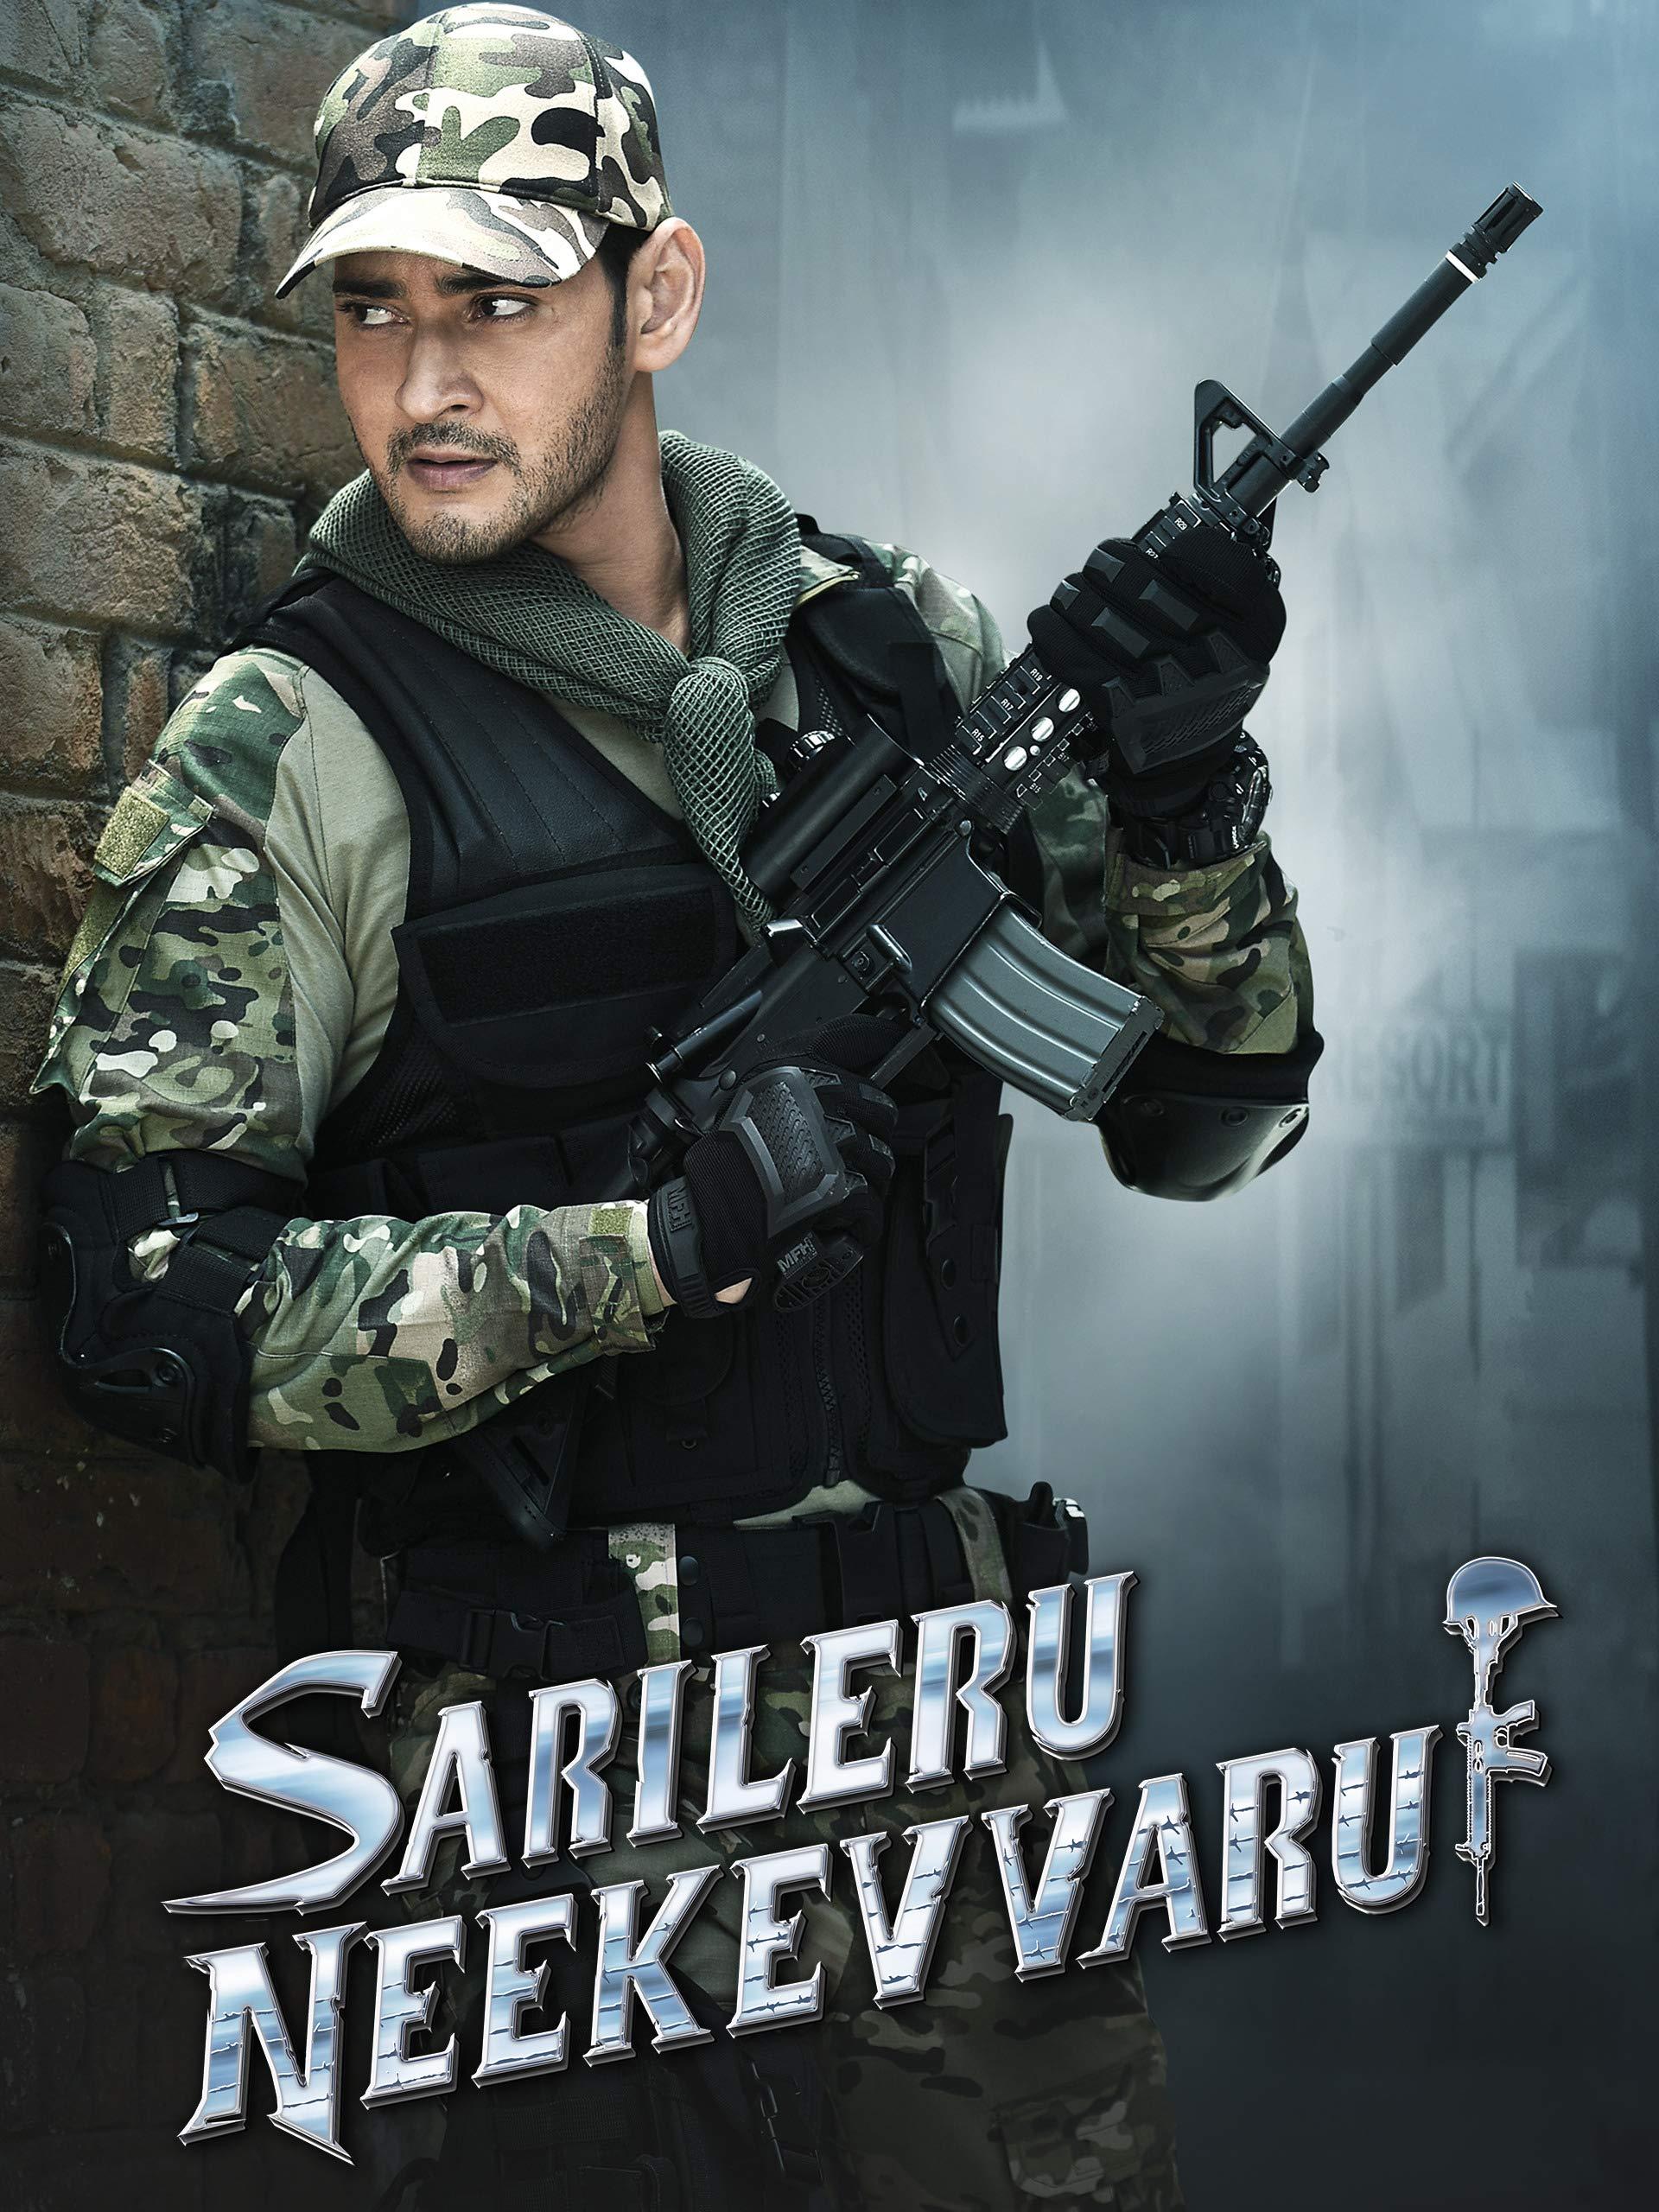 Sarileru Neekevvaru (2021) Hindi Dubbed